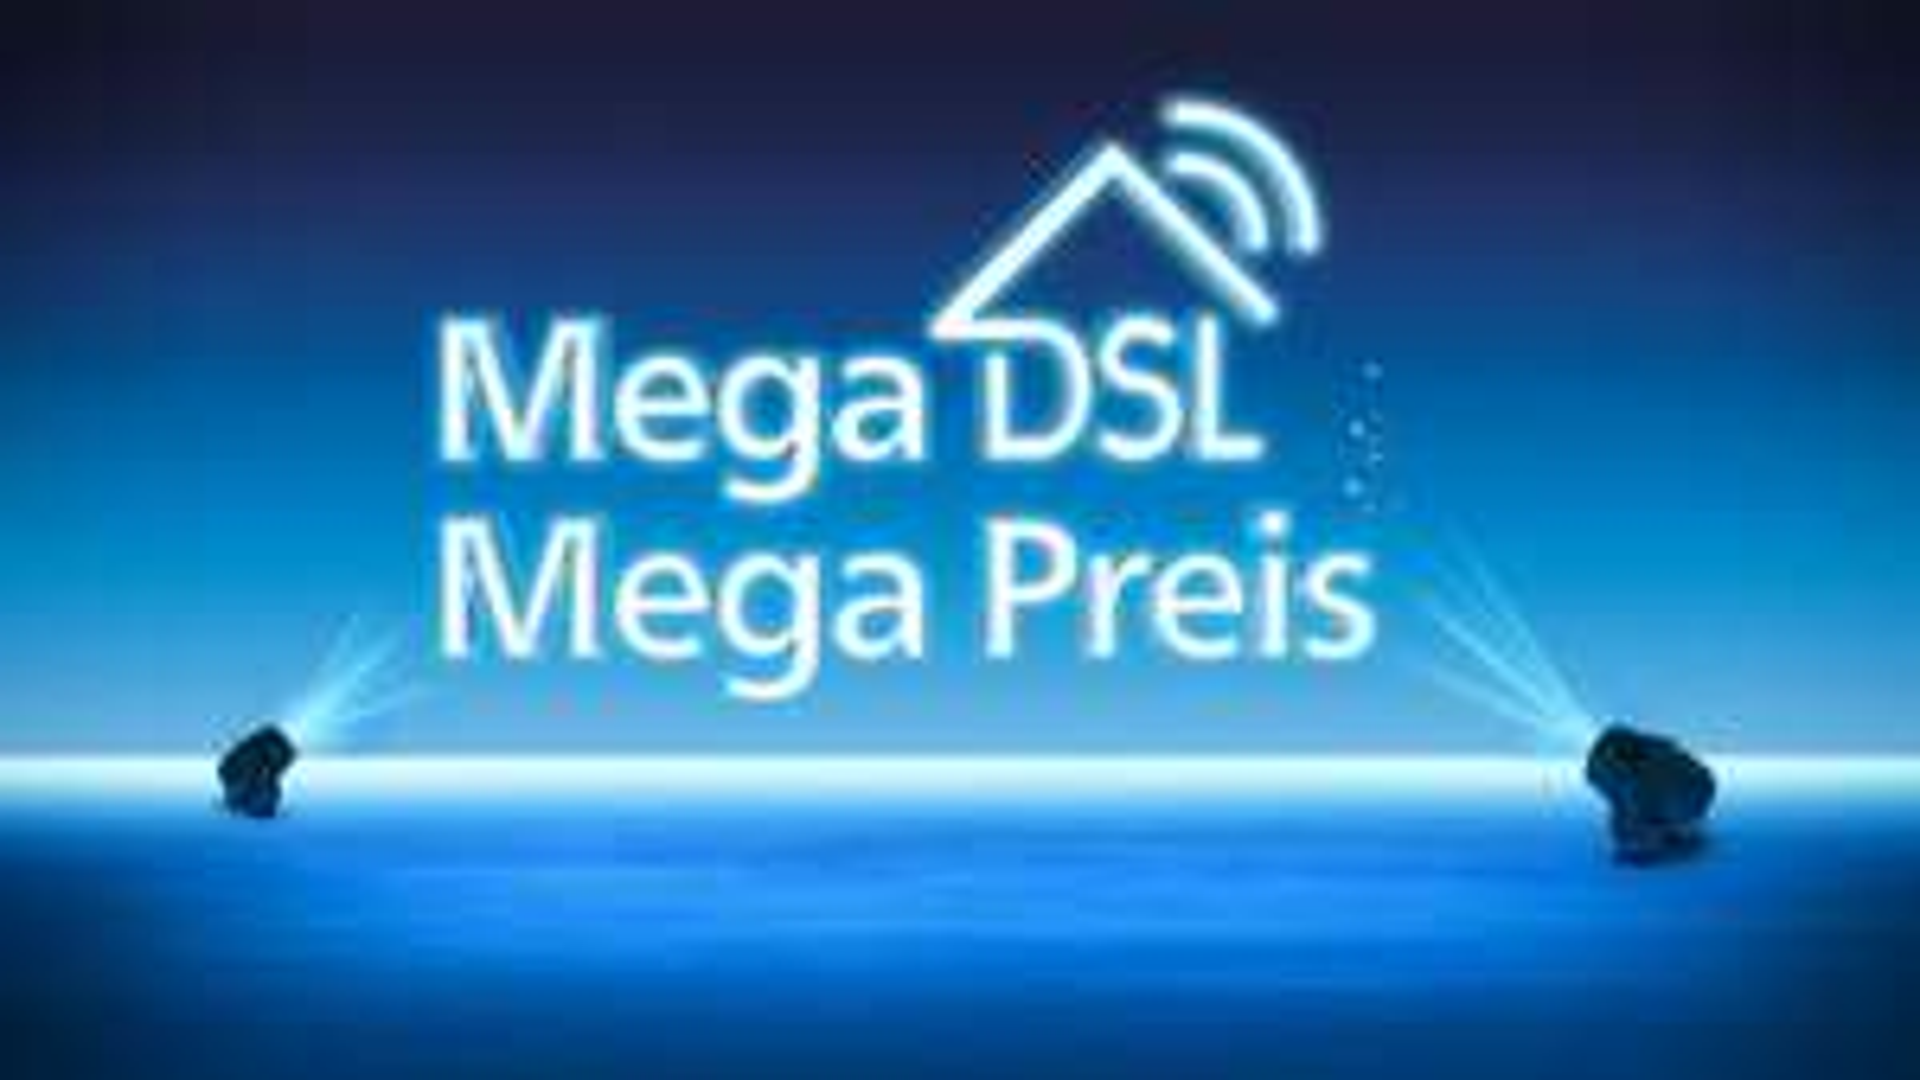 [Check24] O2 my Home S Plus, 15€/Monat, DSL Tarif 25 MBits/s, gedrosselt ab 300GB auf 2 MBits/s